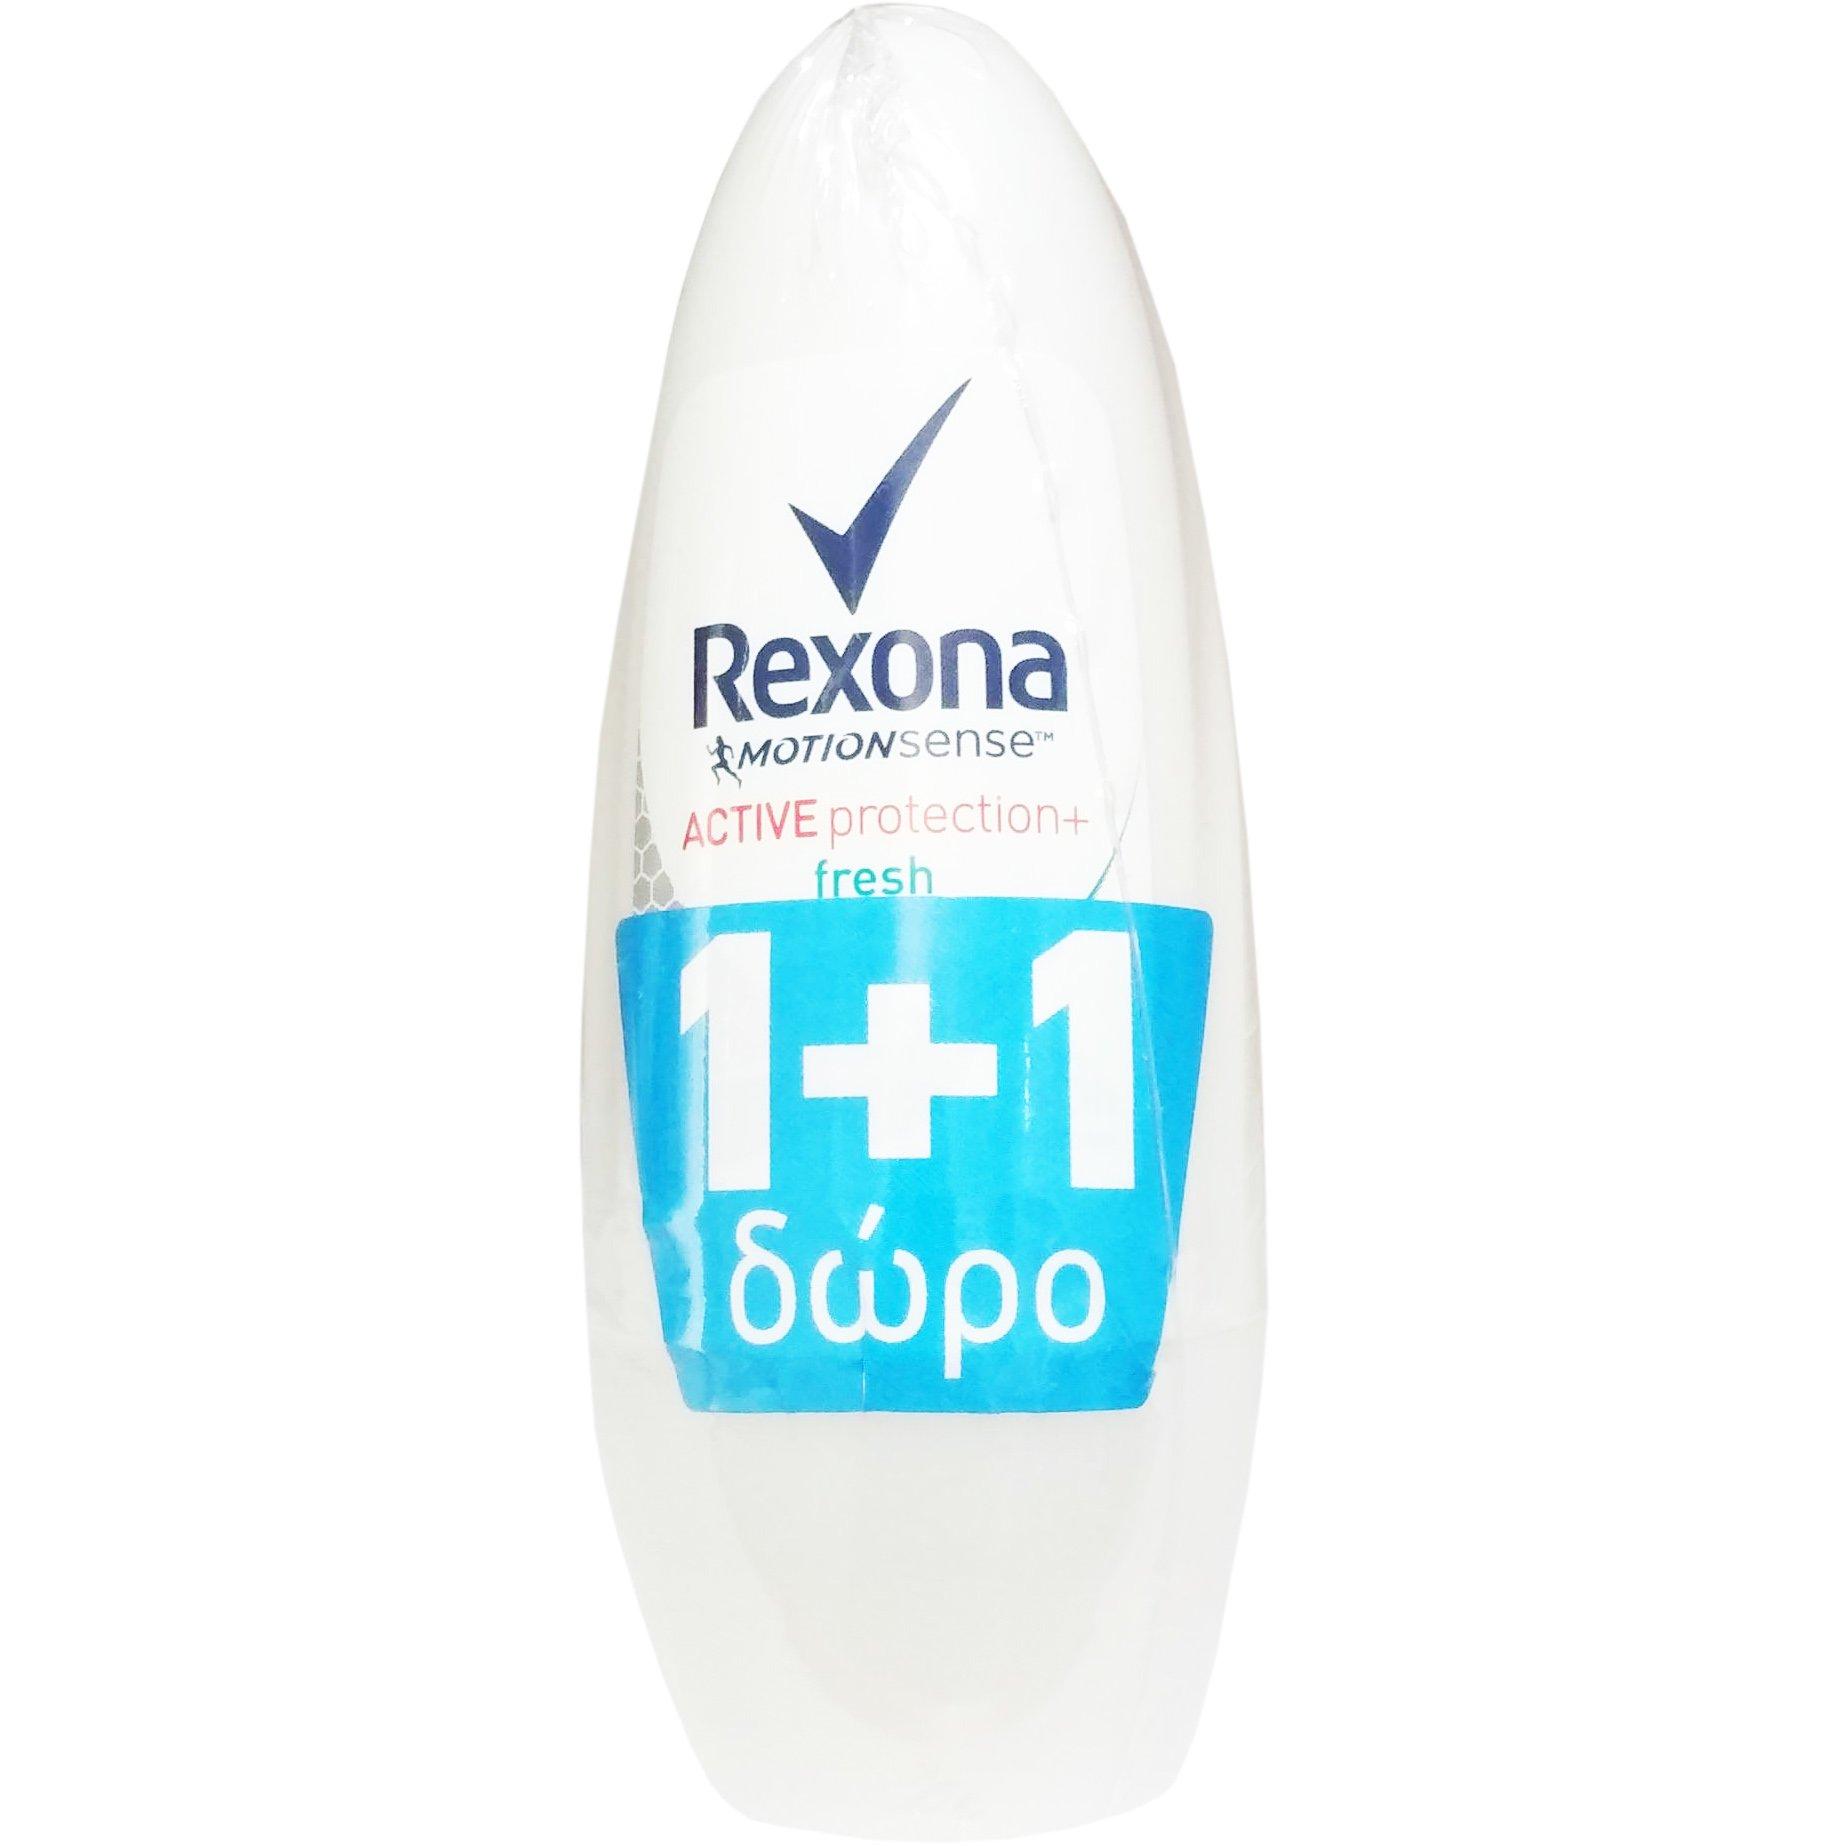 Rexona Πακέτο Προσφοράς Active Protection+ Fresh Roll On Αποσμητικό για Αίσθηση Φρεσκάδας 2x50ml 1+1 Δώρο